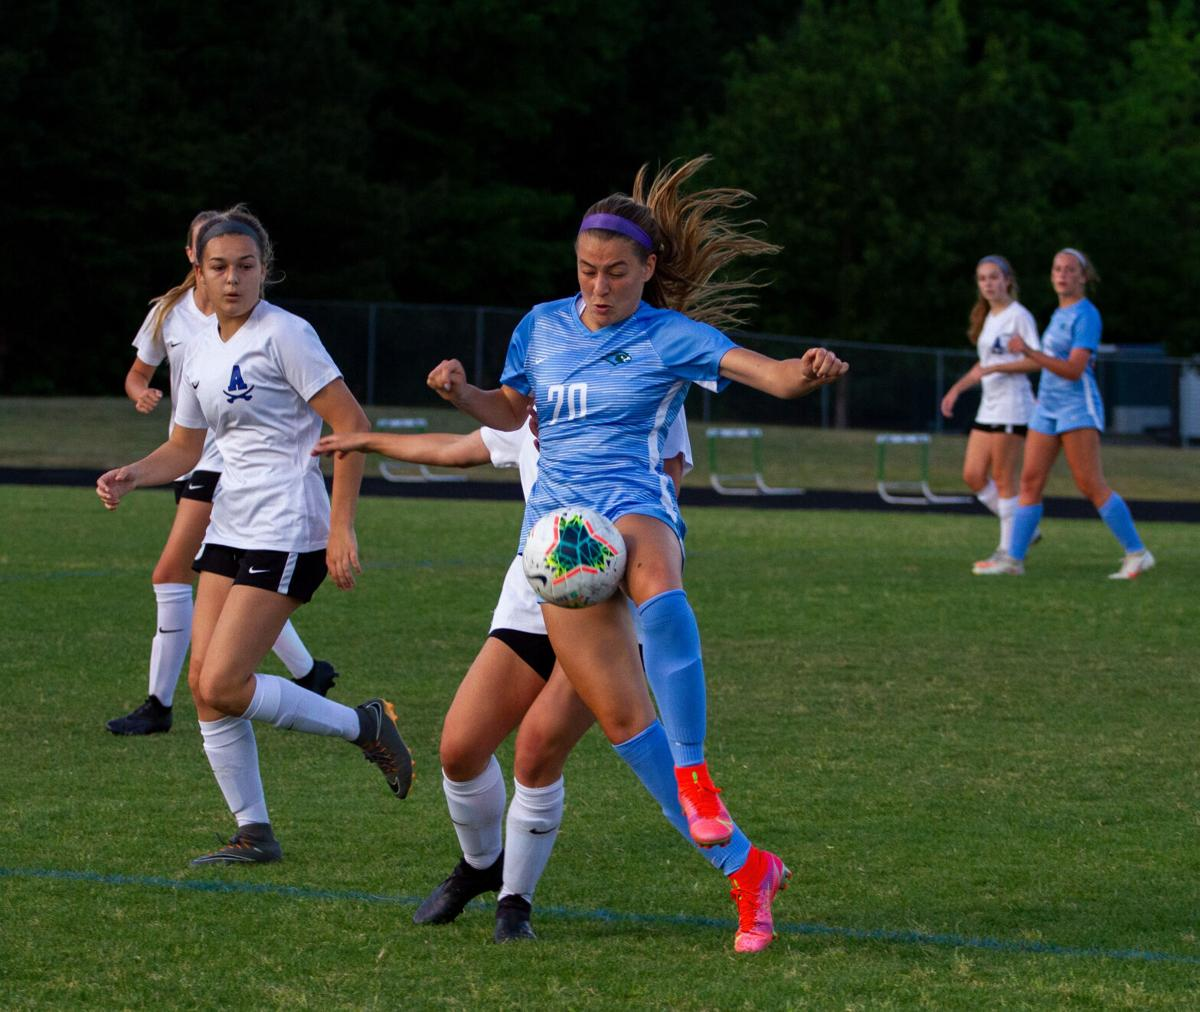 Atlee at Hanover girls soccer: Gajarsky-Prado gets the ball